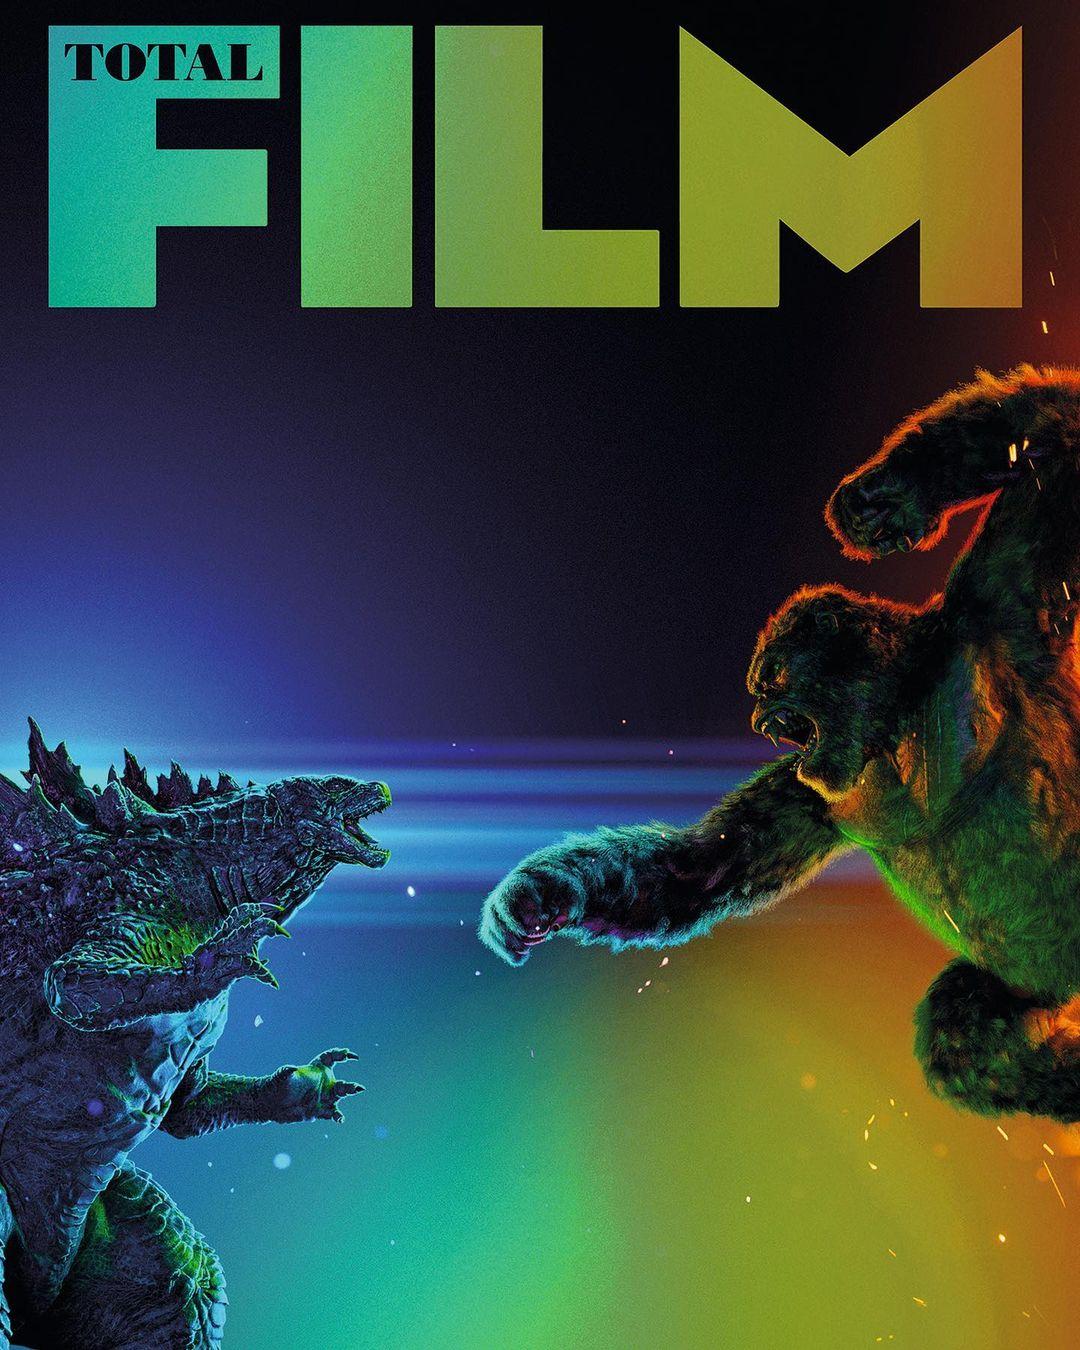 Godzilla vs Kong Total Film magazine